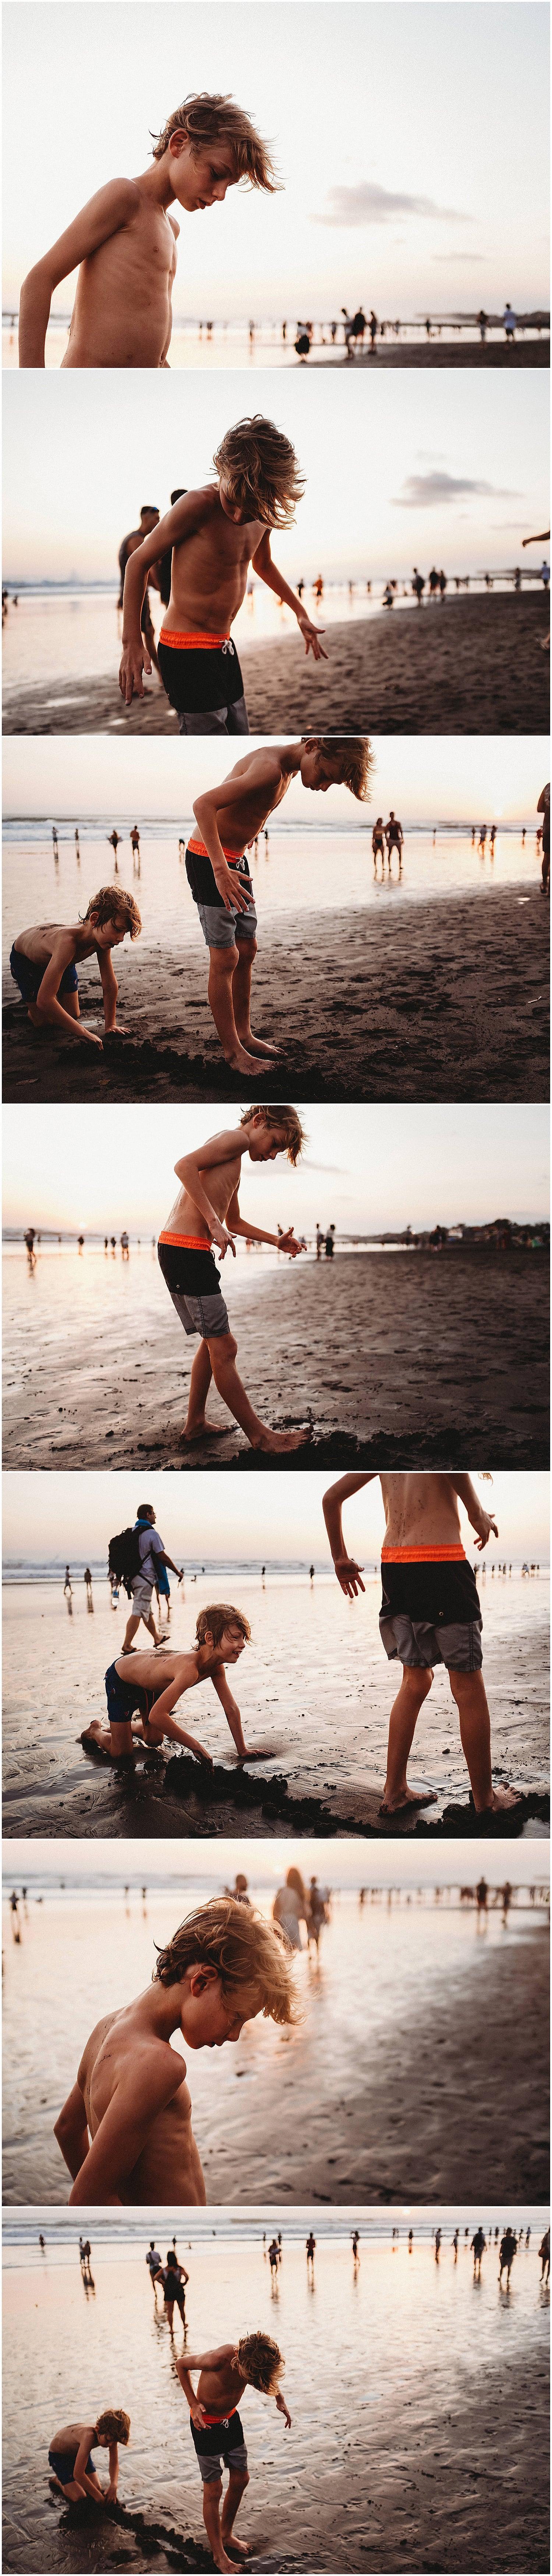 Bali-Canggu-Sunset-sand-fun